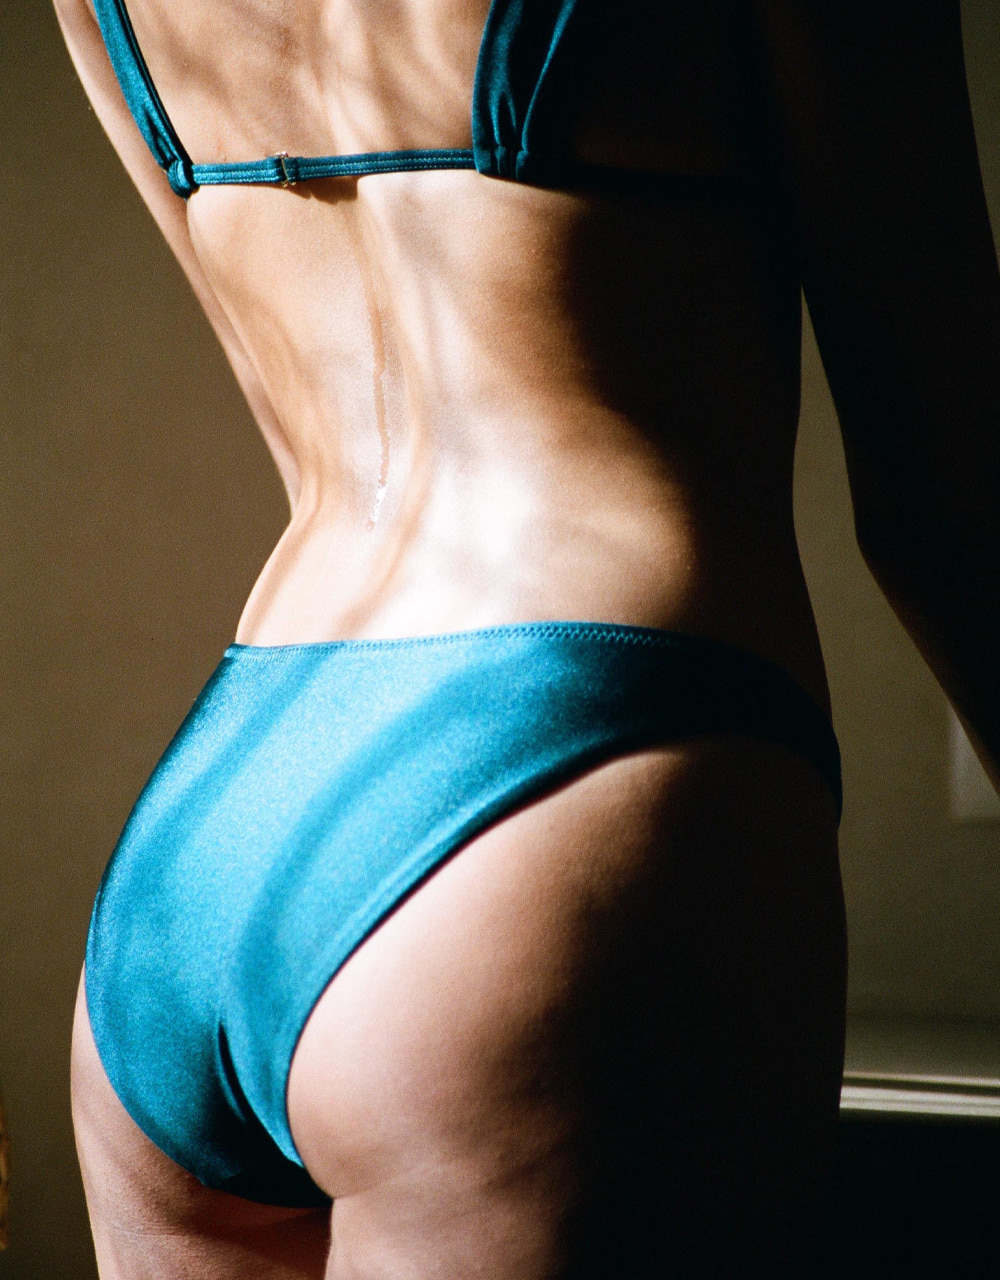 swimsuit bikini bottom Amalfi Blue 20 € Girls In Paris photo 2